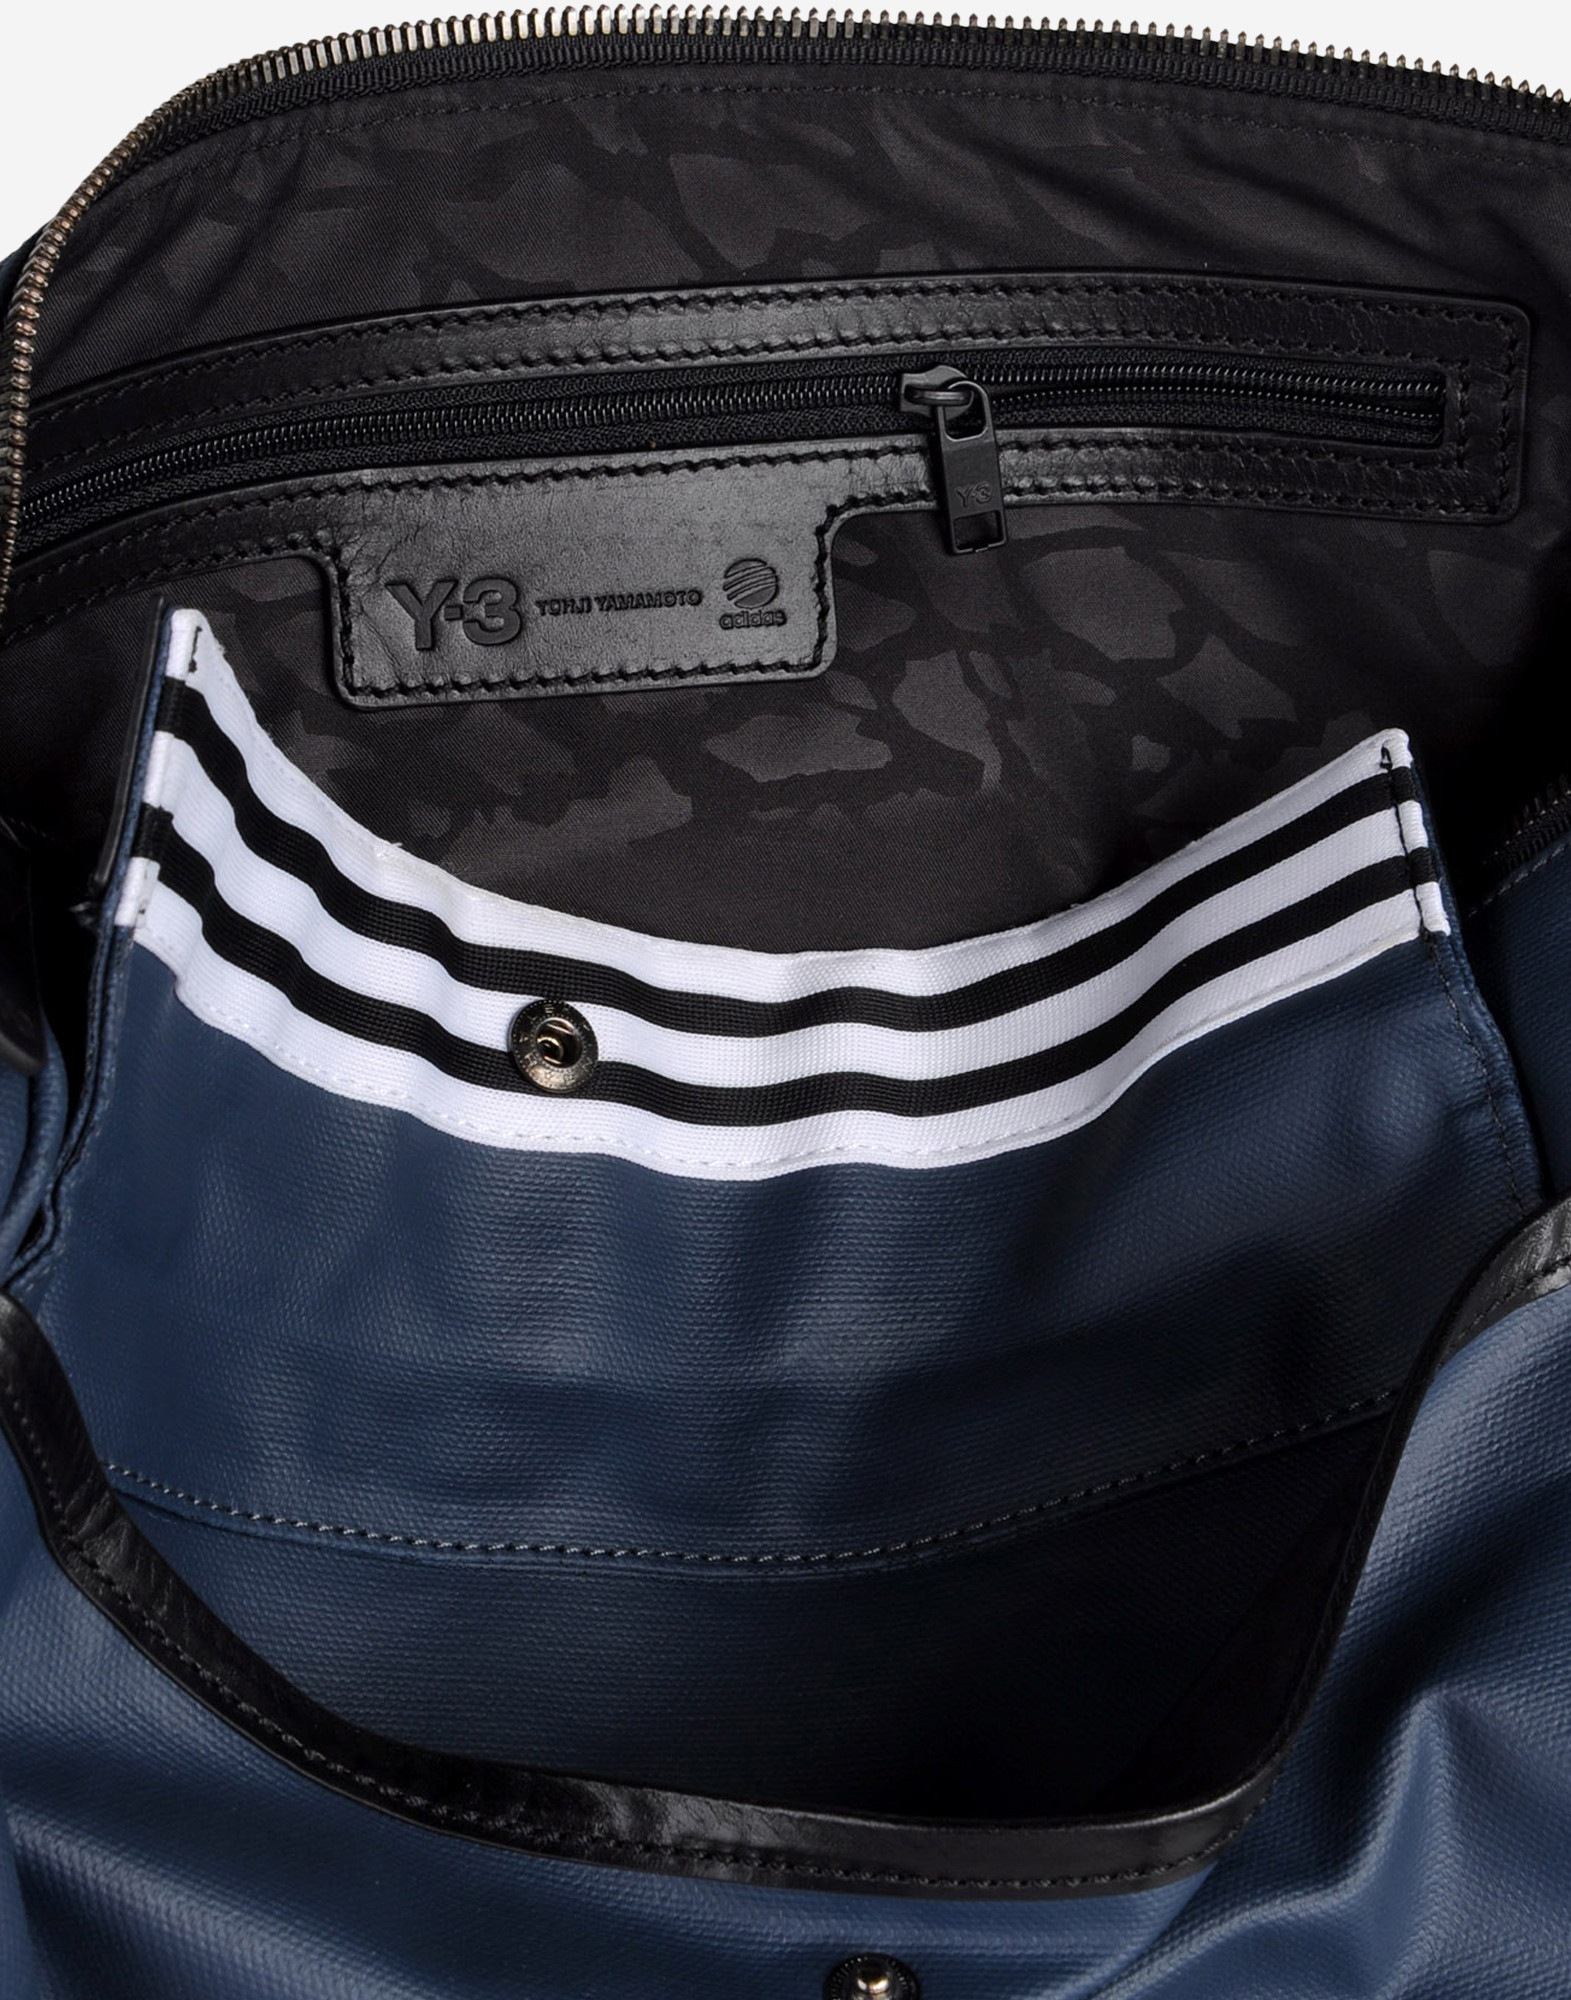 Y-3 Y-3 Toile Sling Bag 2 Shoulder bag Man e ... f74f2eea07a51